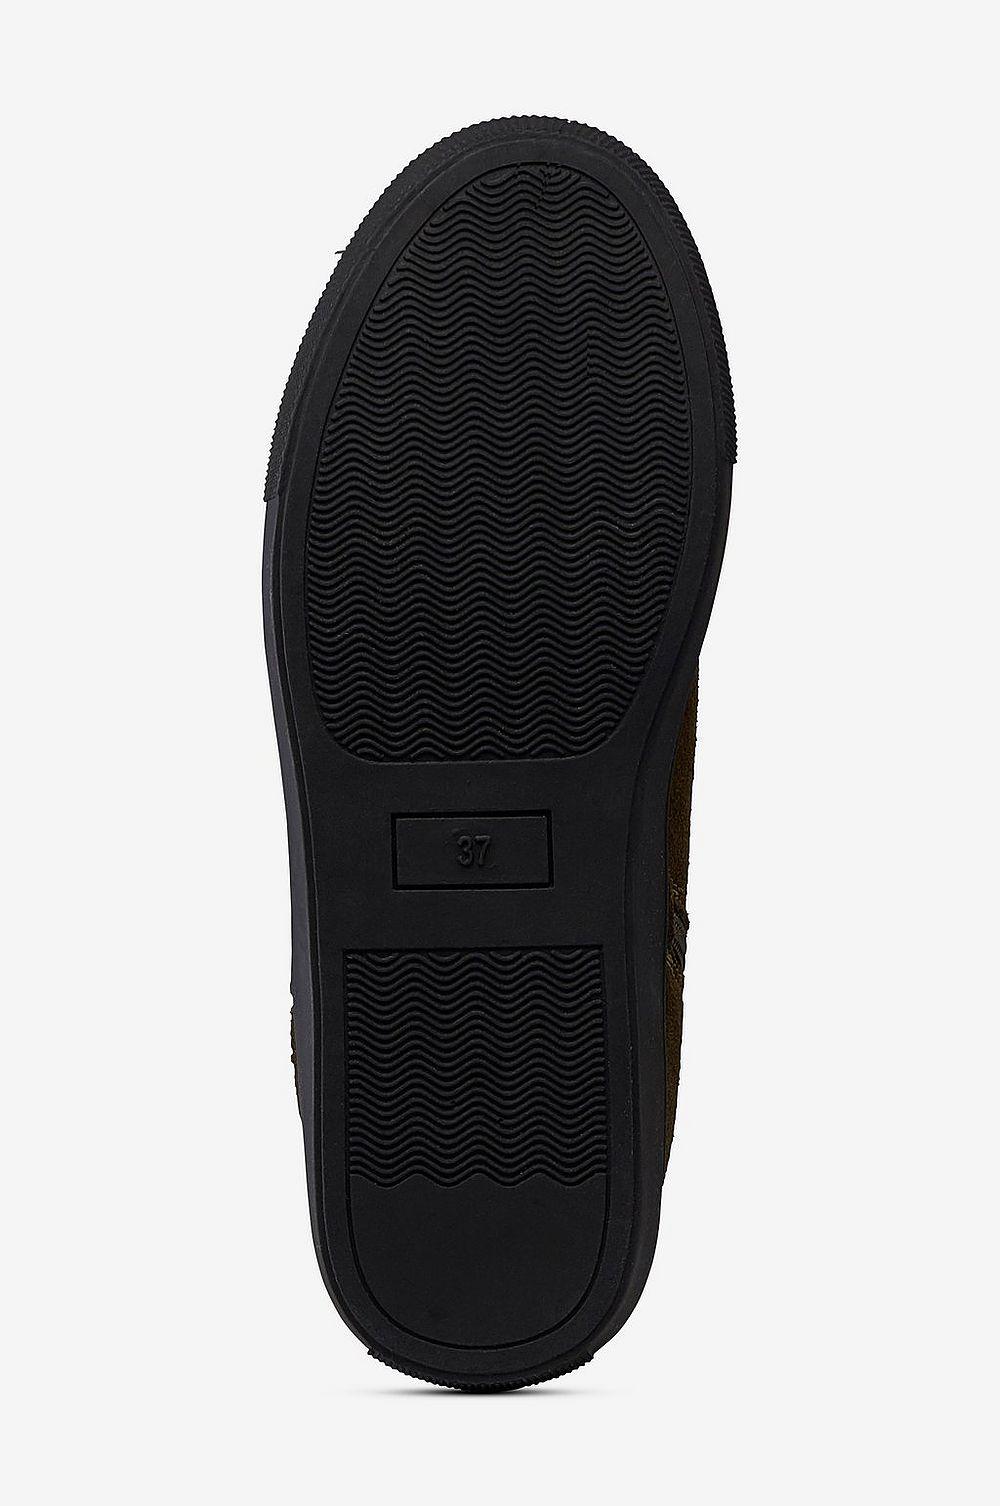 70da55d9107 Duffy Boots med med med varmfoder Grön Dam d7b9e8 - skor ...